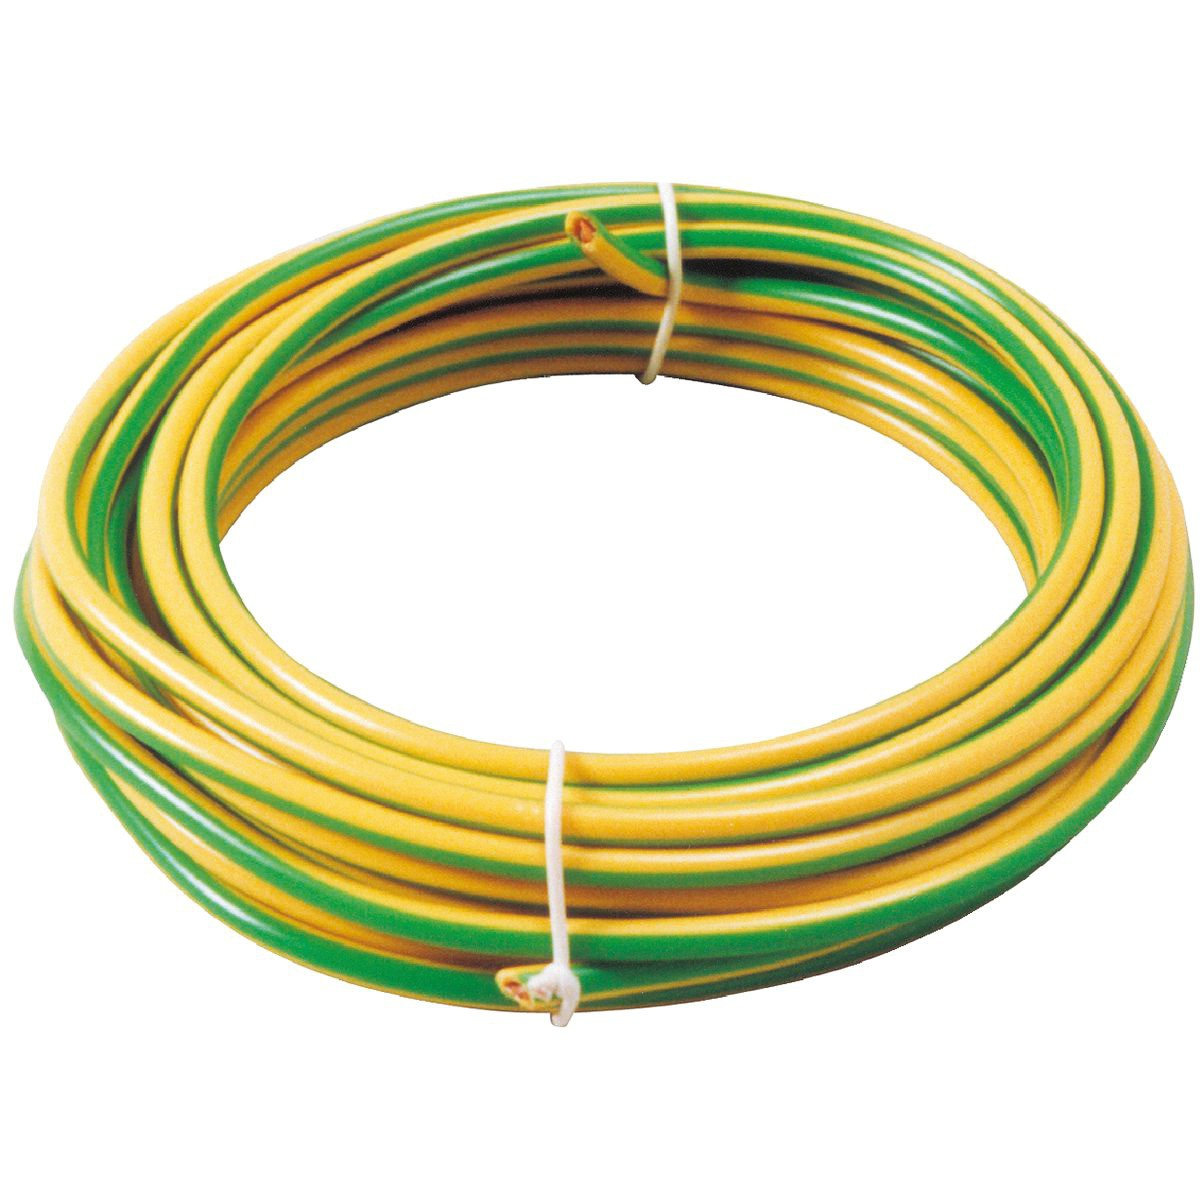 Fil H07 V-U 1,5 mm² Dhome - Longueur 5 m - Vert / jaune